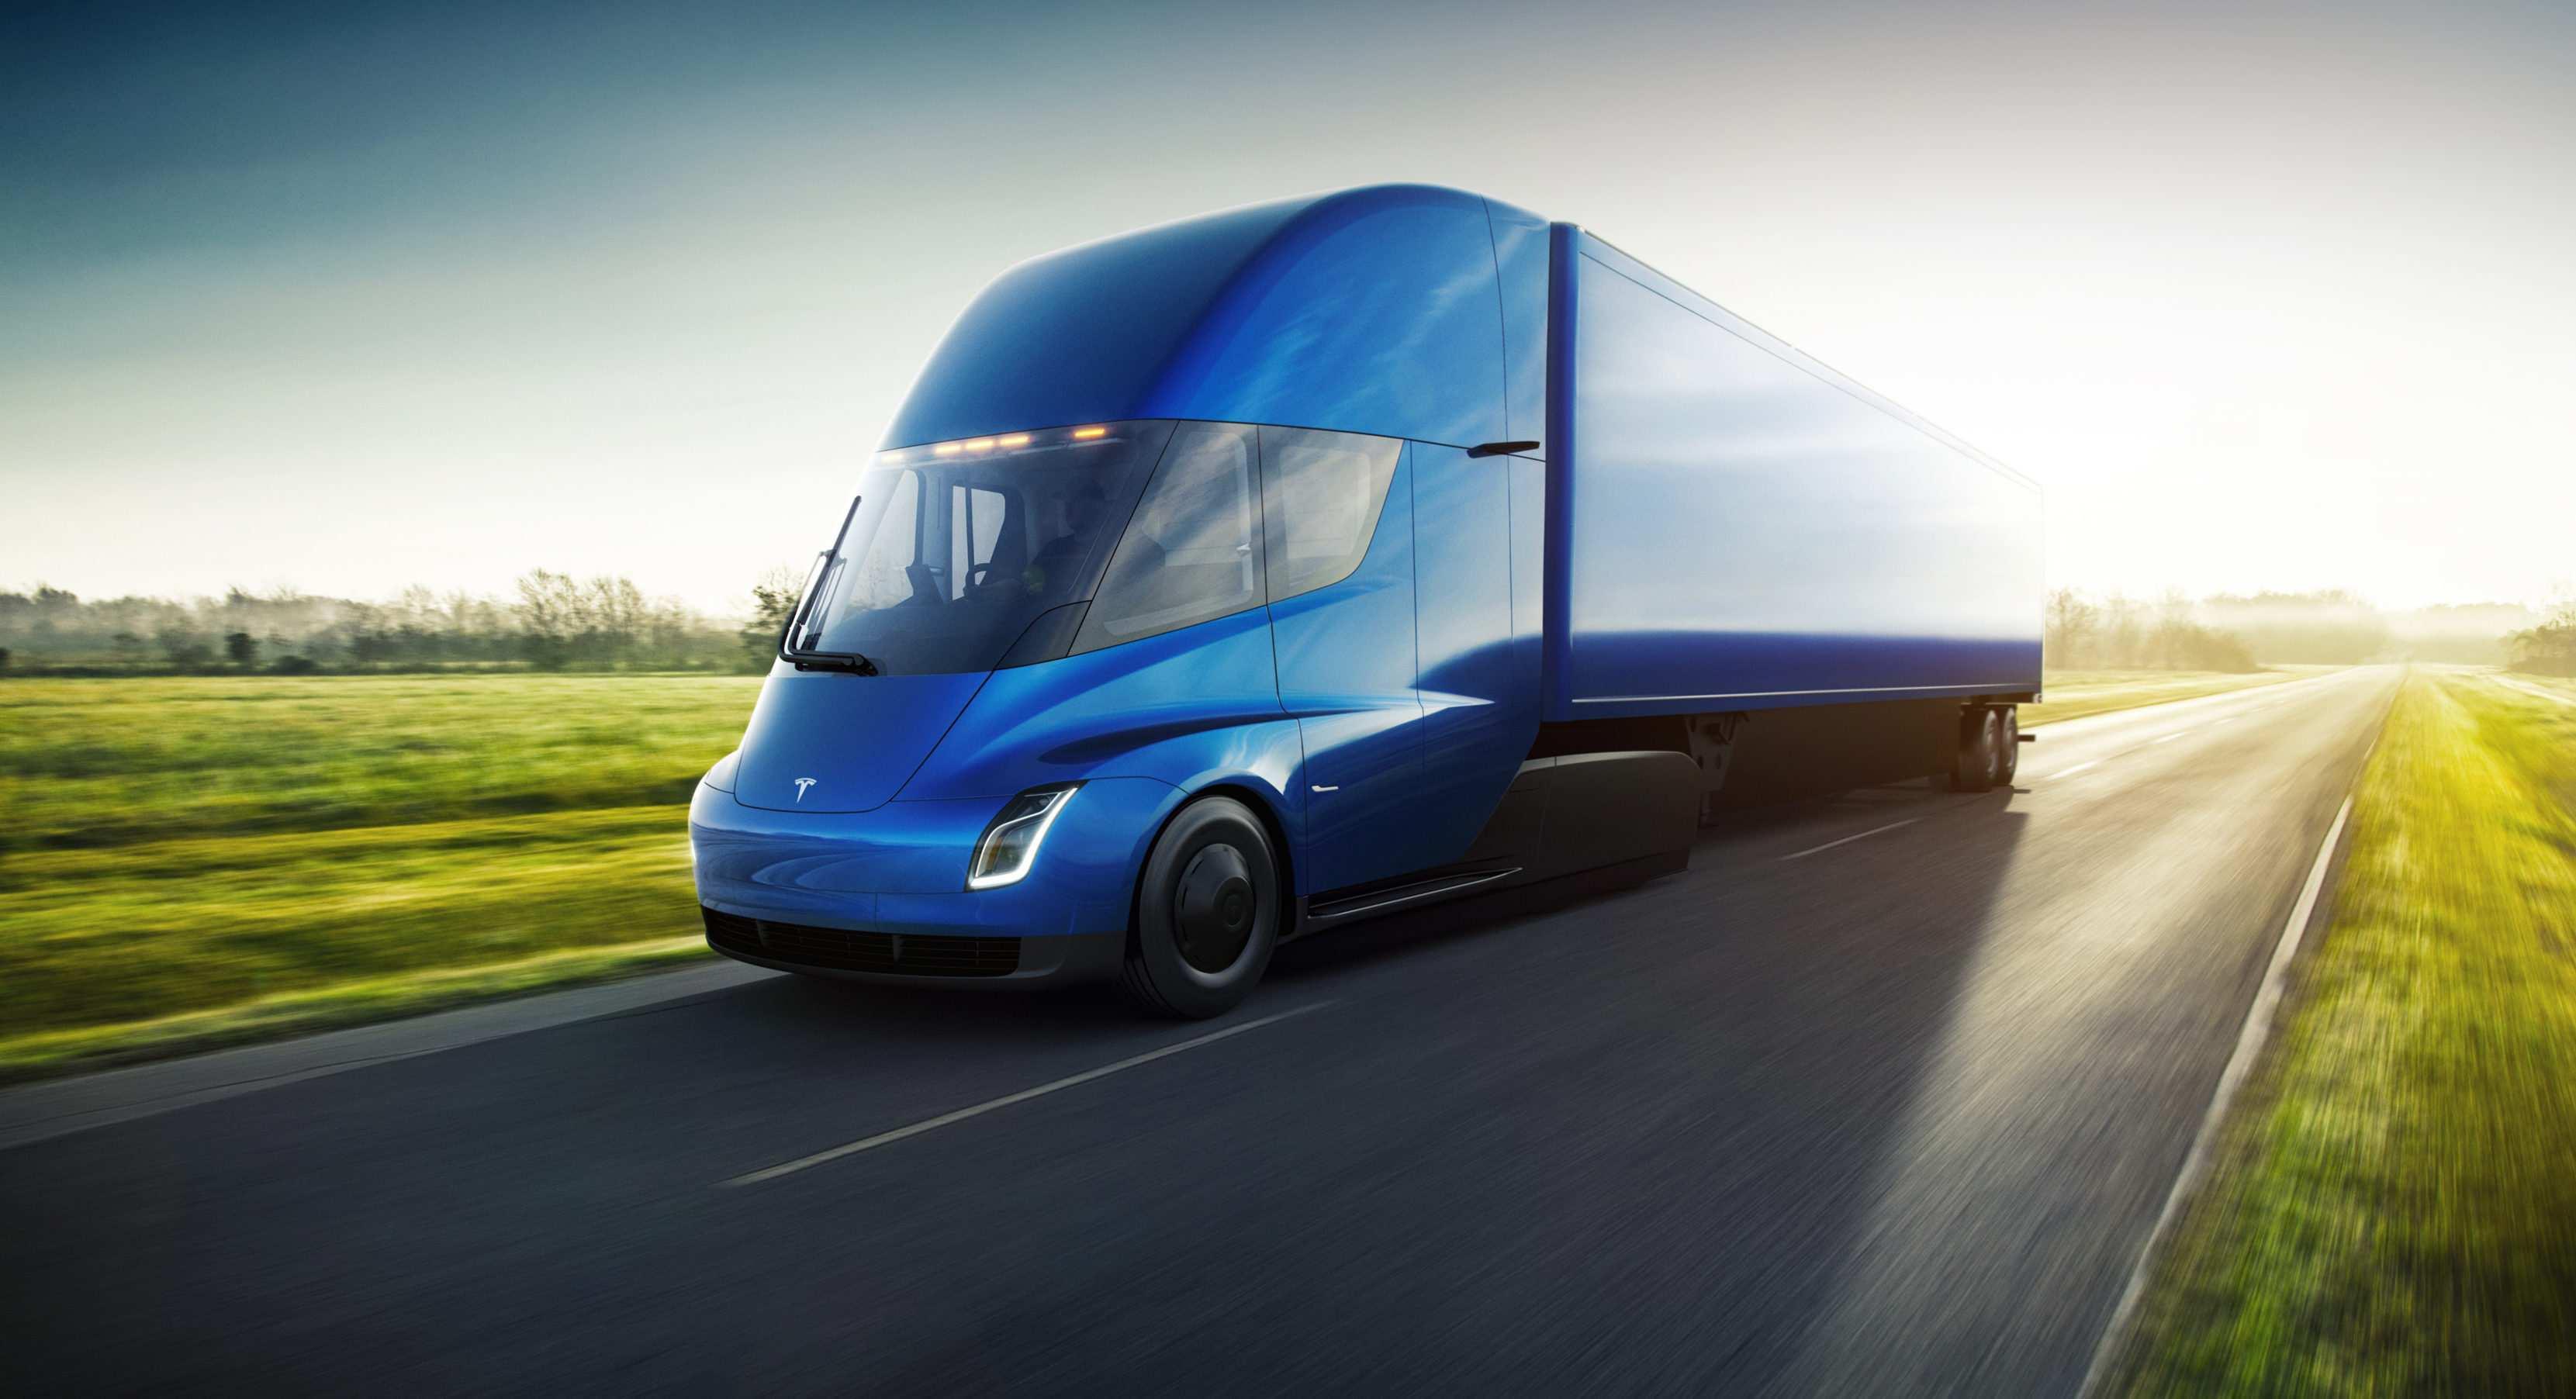 75 Best Review 2019 Tesla Semi Truck Concept for 2019 Tesla Semi Truck